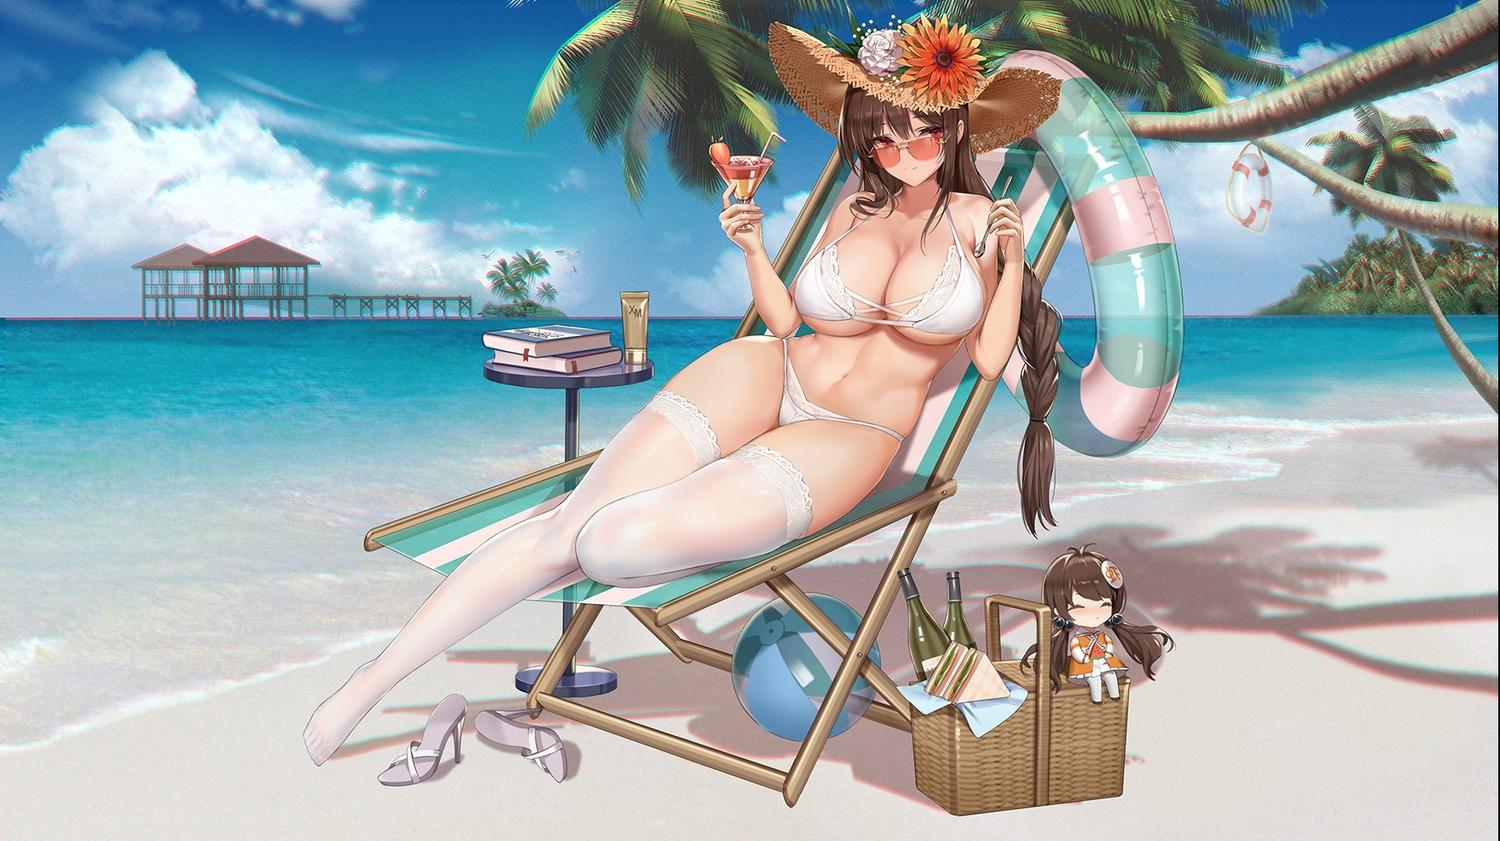 ball beach bikini book braids clouds drink food iron_saga sky sunglasses swim_ring swimsuit thighhighs tree water zjsstc